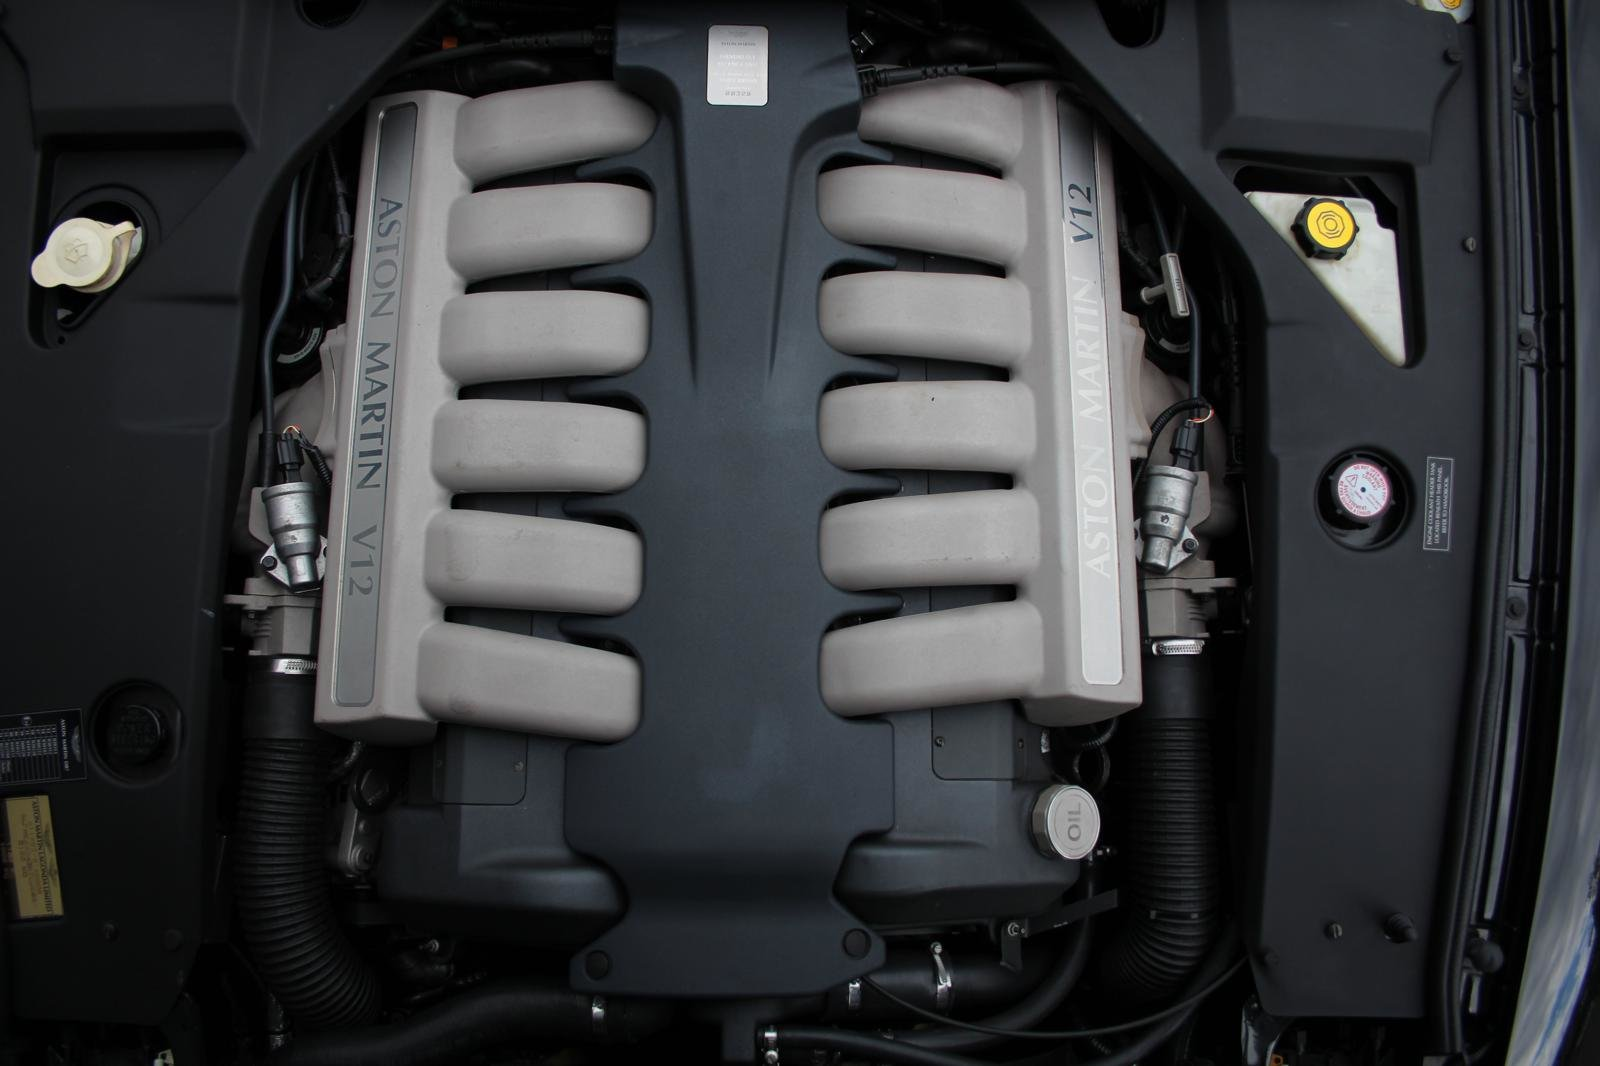 2004 Aston Martin DB 7 GT Zagato LHD  For Sale (picture 4 of 6)